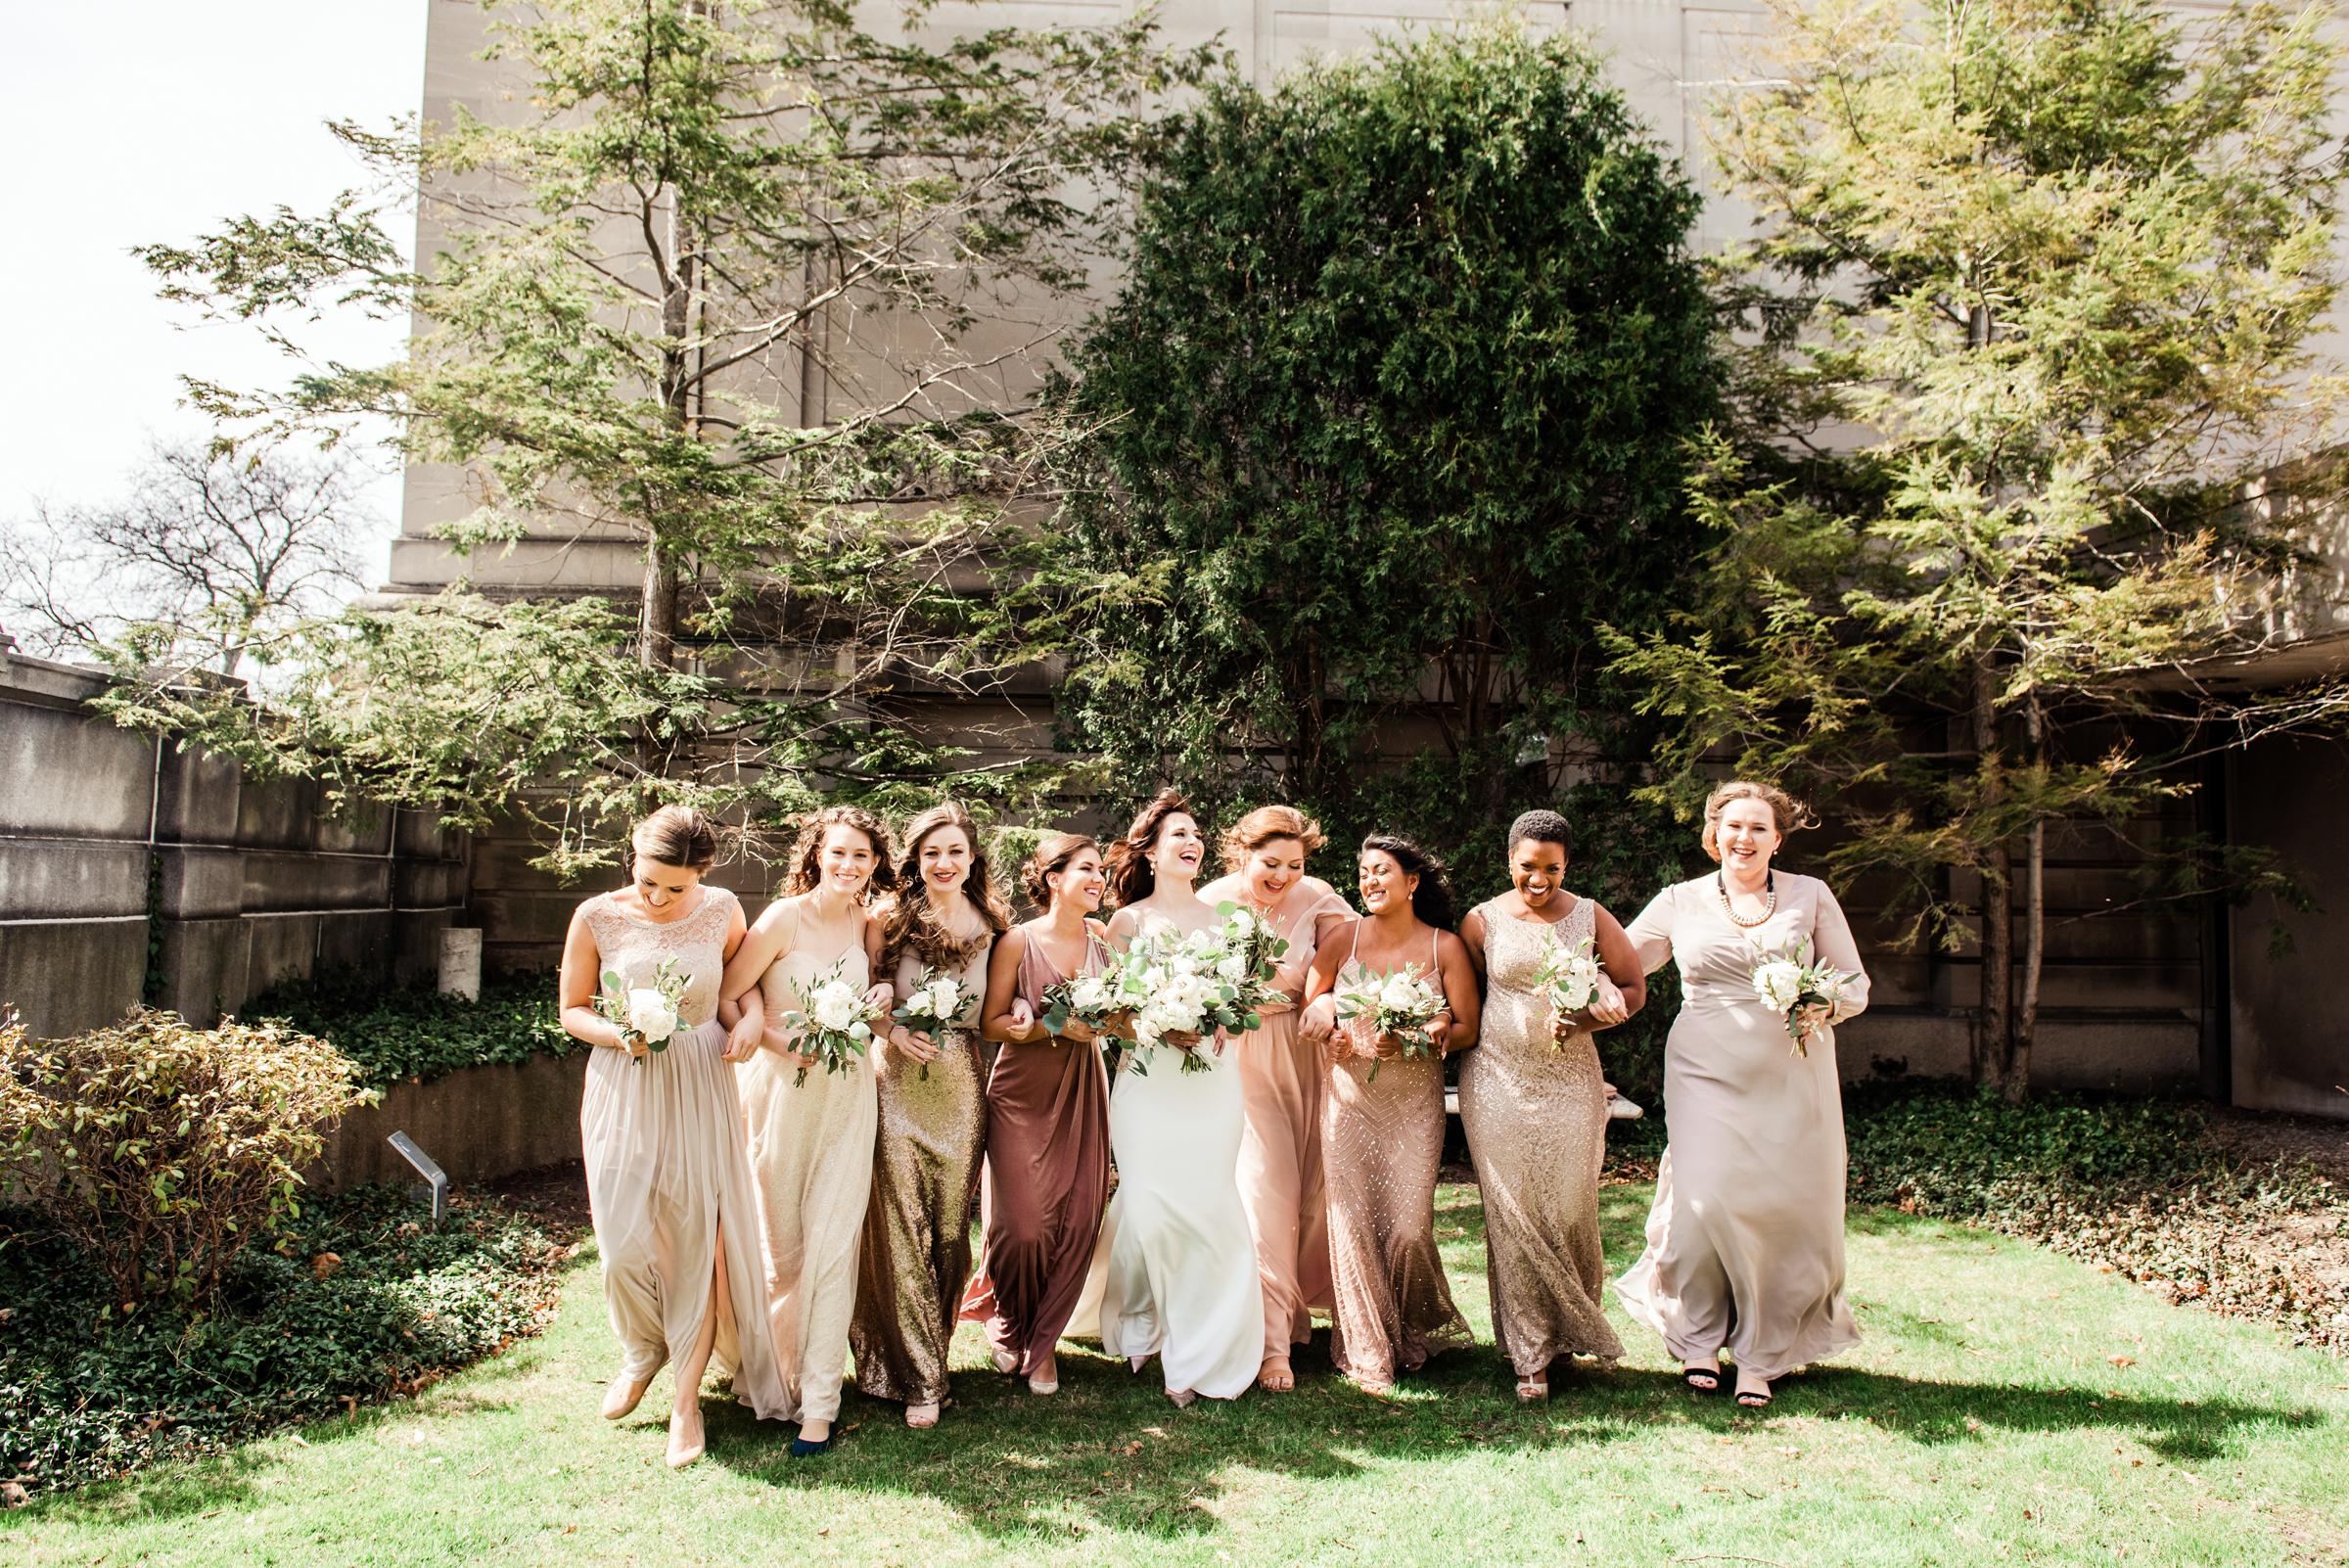 The_Arbor_LoftRochester_Wedding_JILL_STUDIO_Rochester_NY_Photographer_144943.jpg